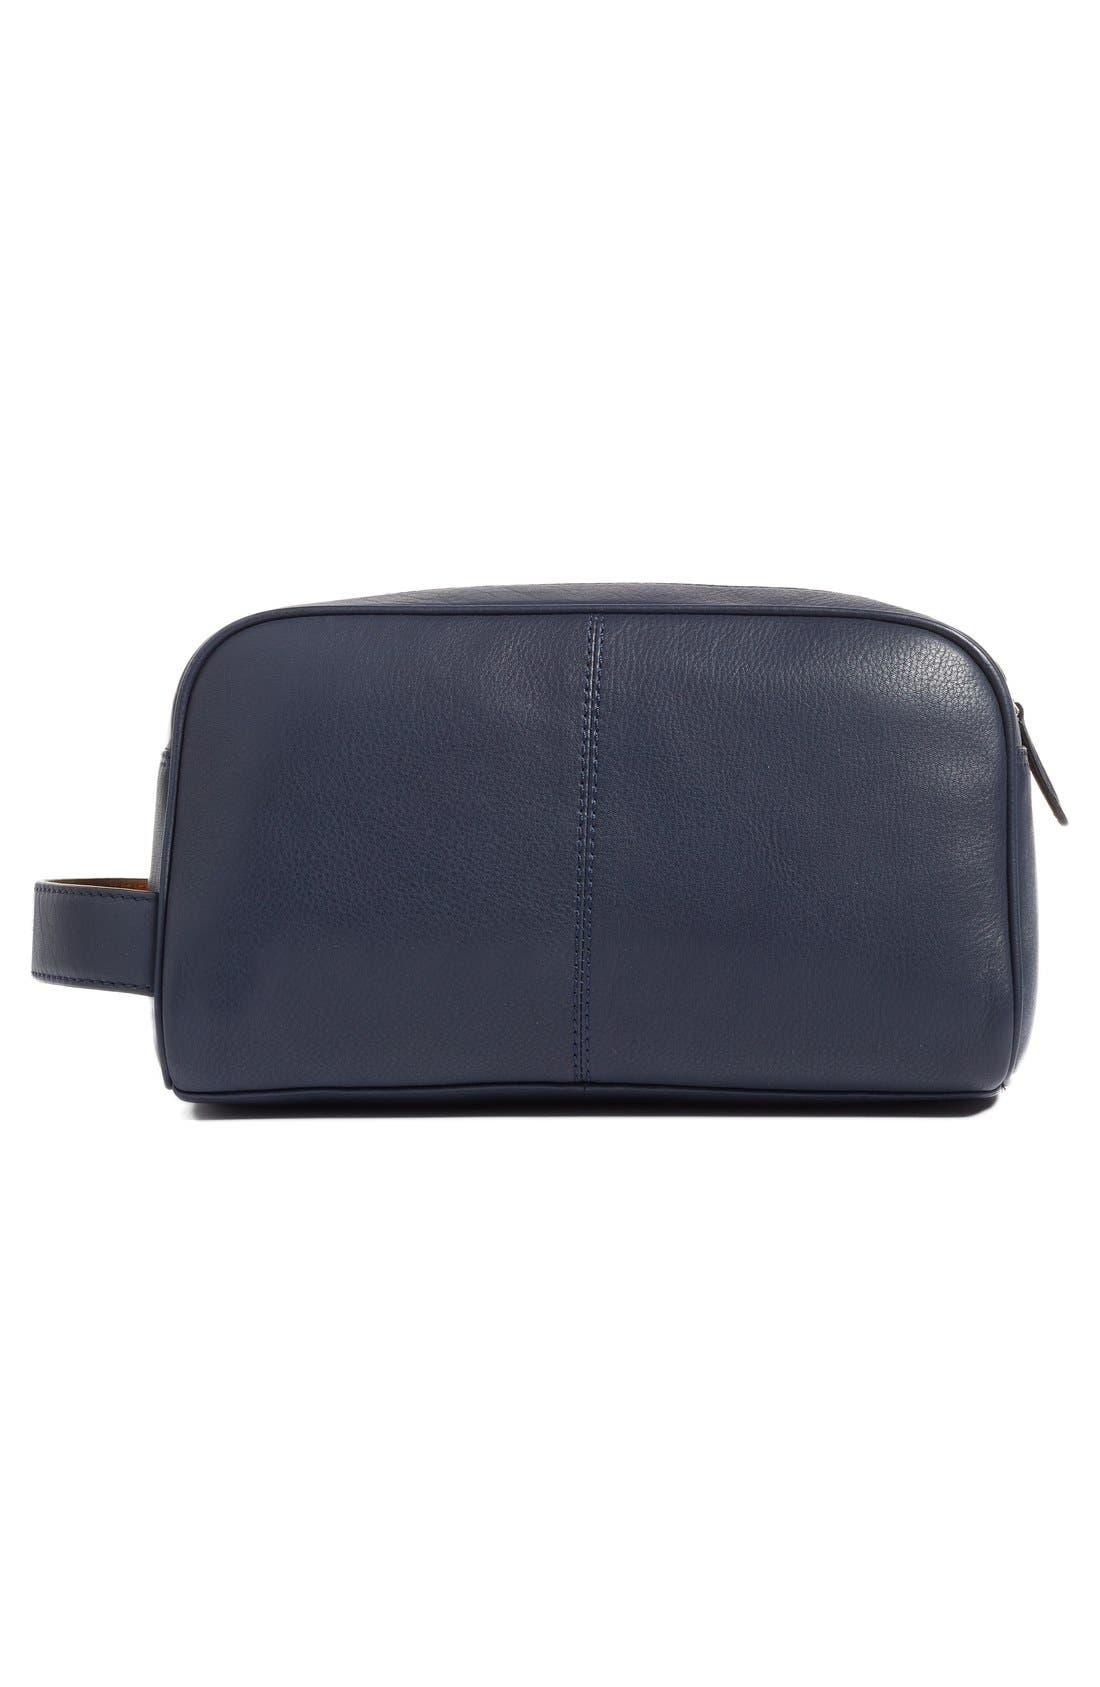 'Footsy' Leather Travel Kit,                             Alternate thumbnail 4, color,                             410